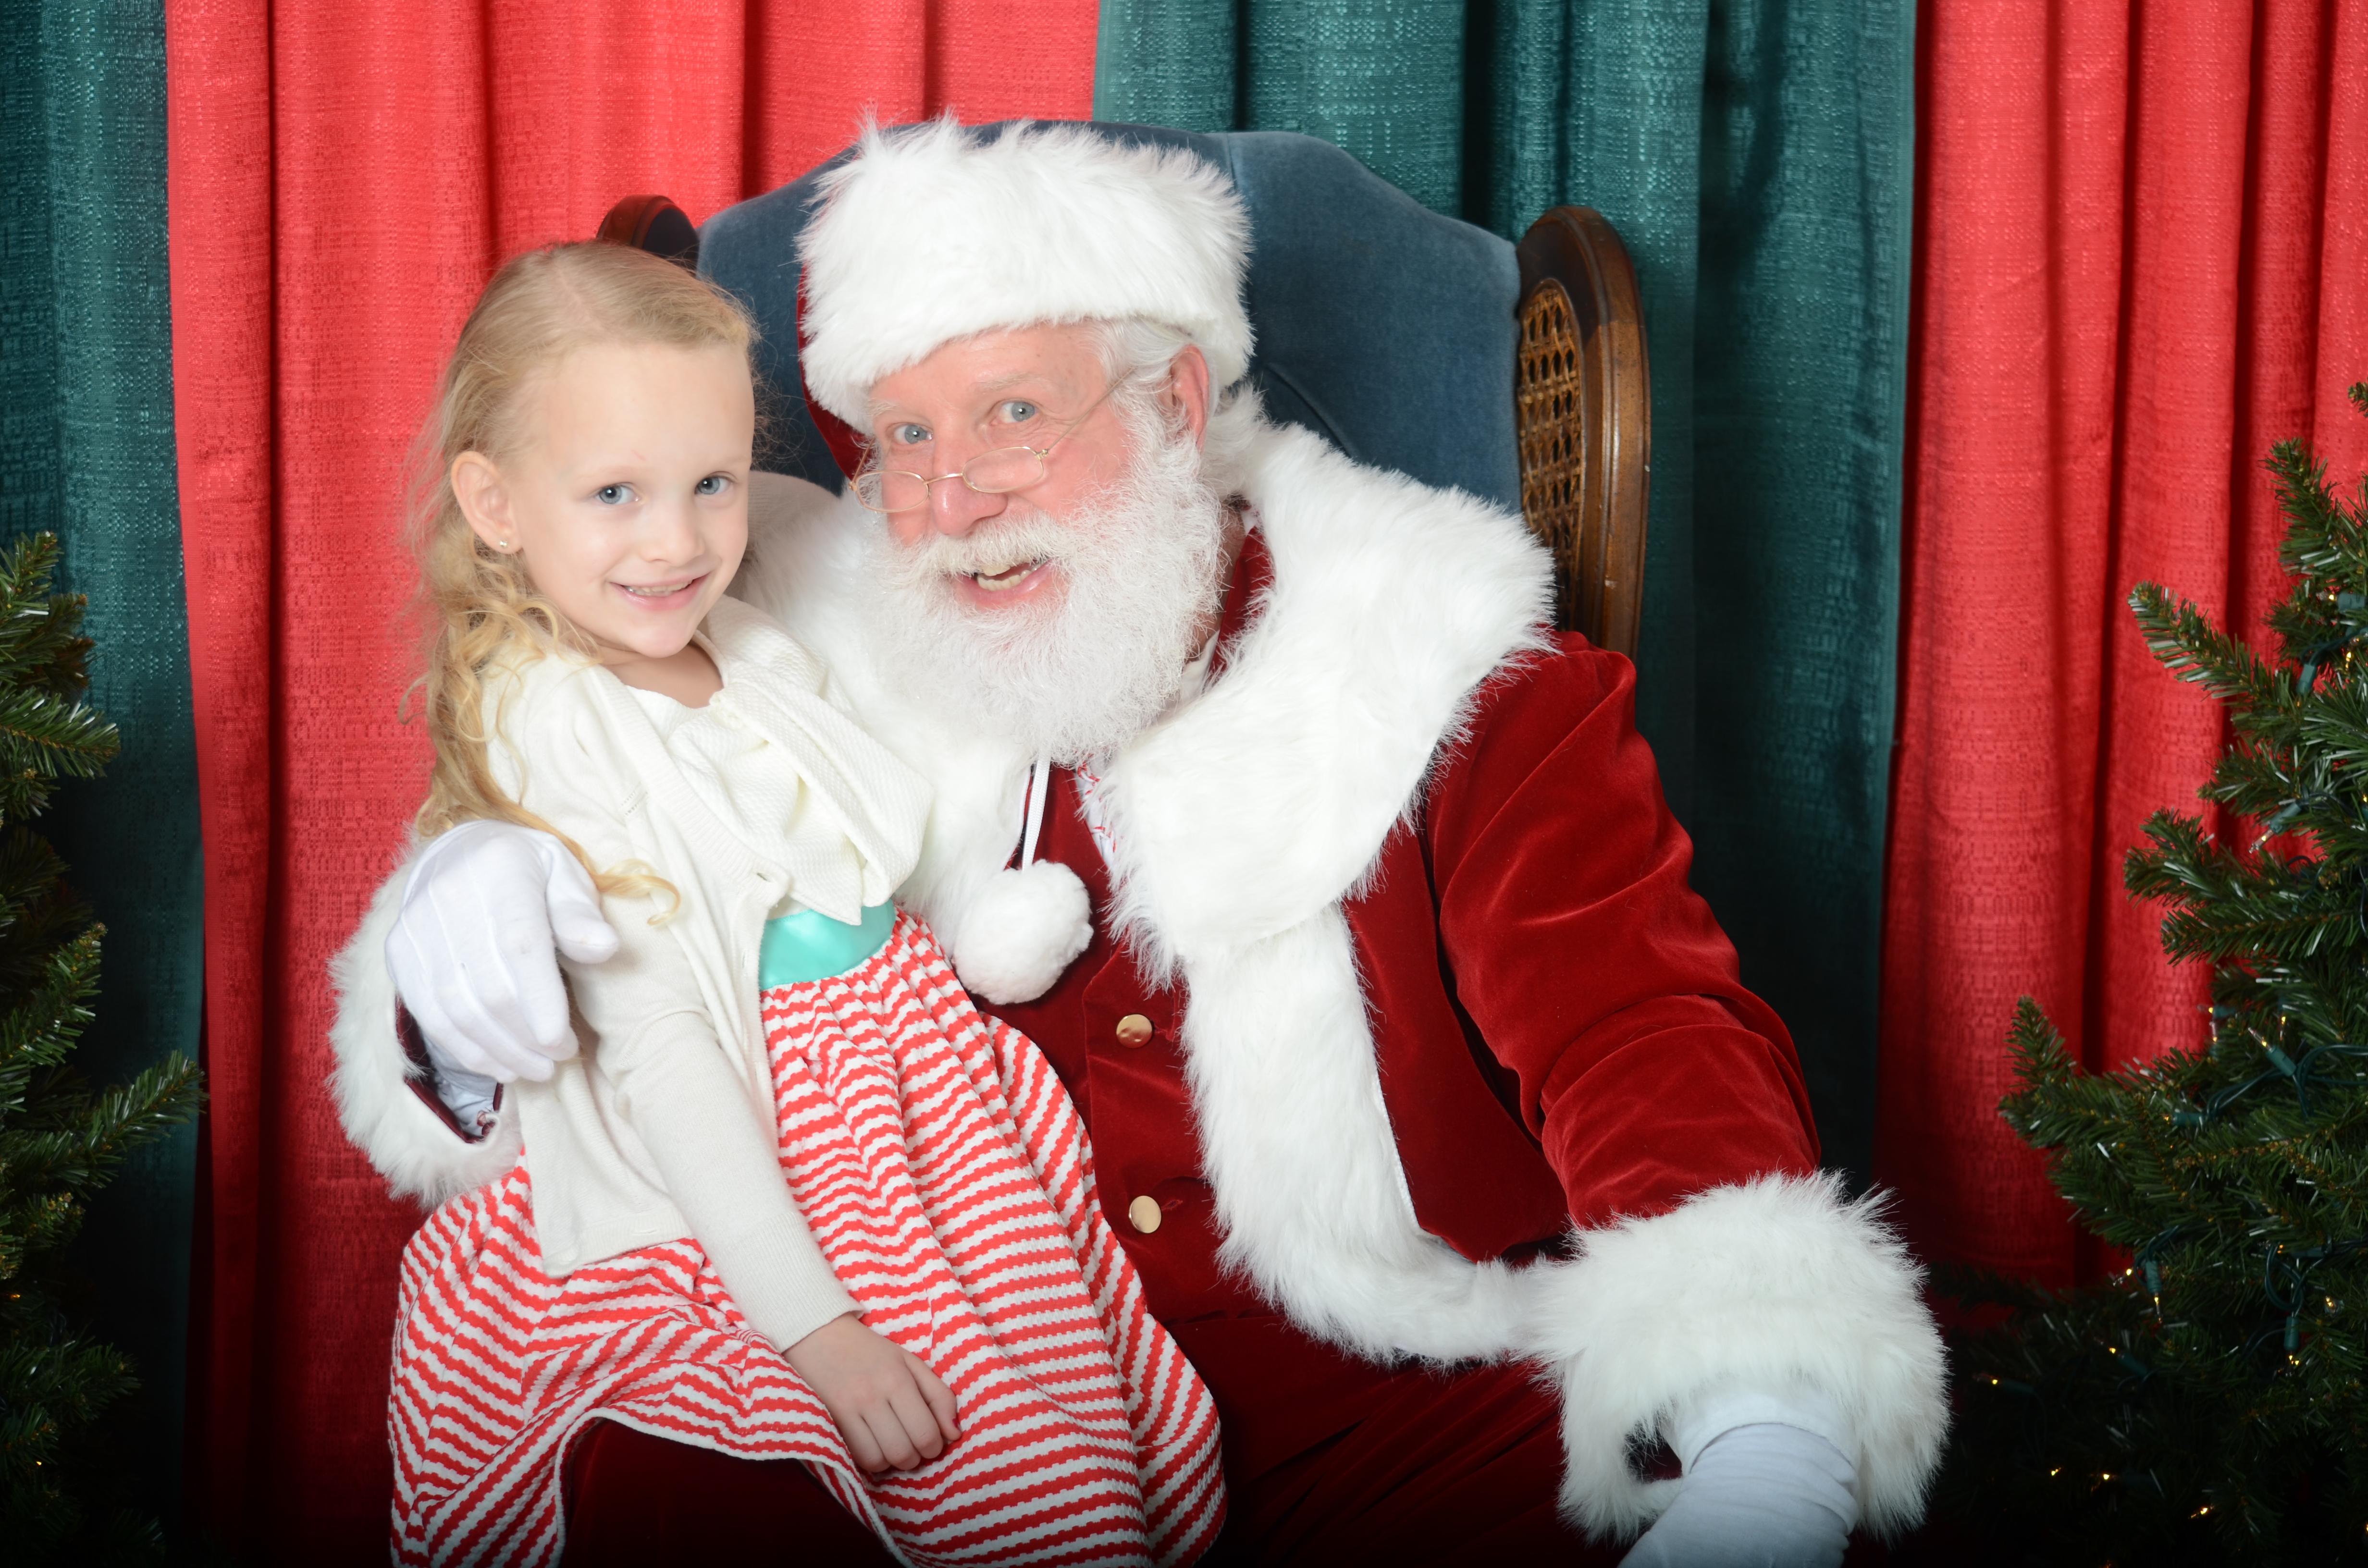 Papa HoHo - Professional Santa Claus in Northern Virginia